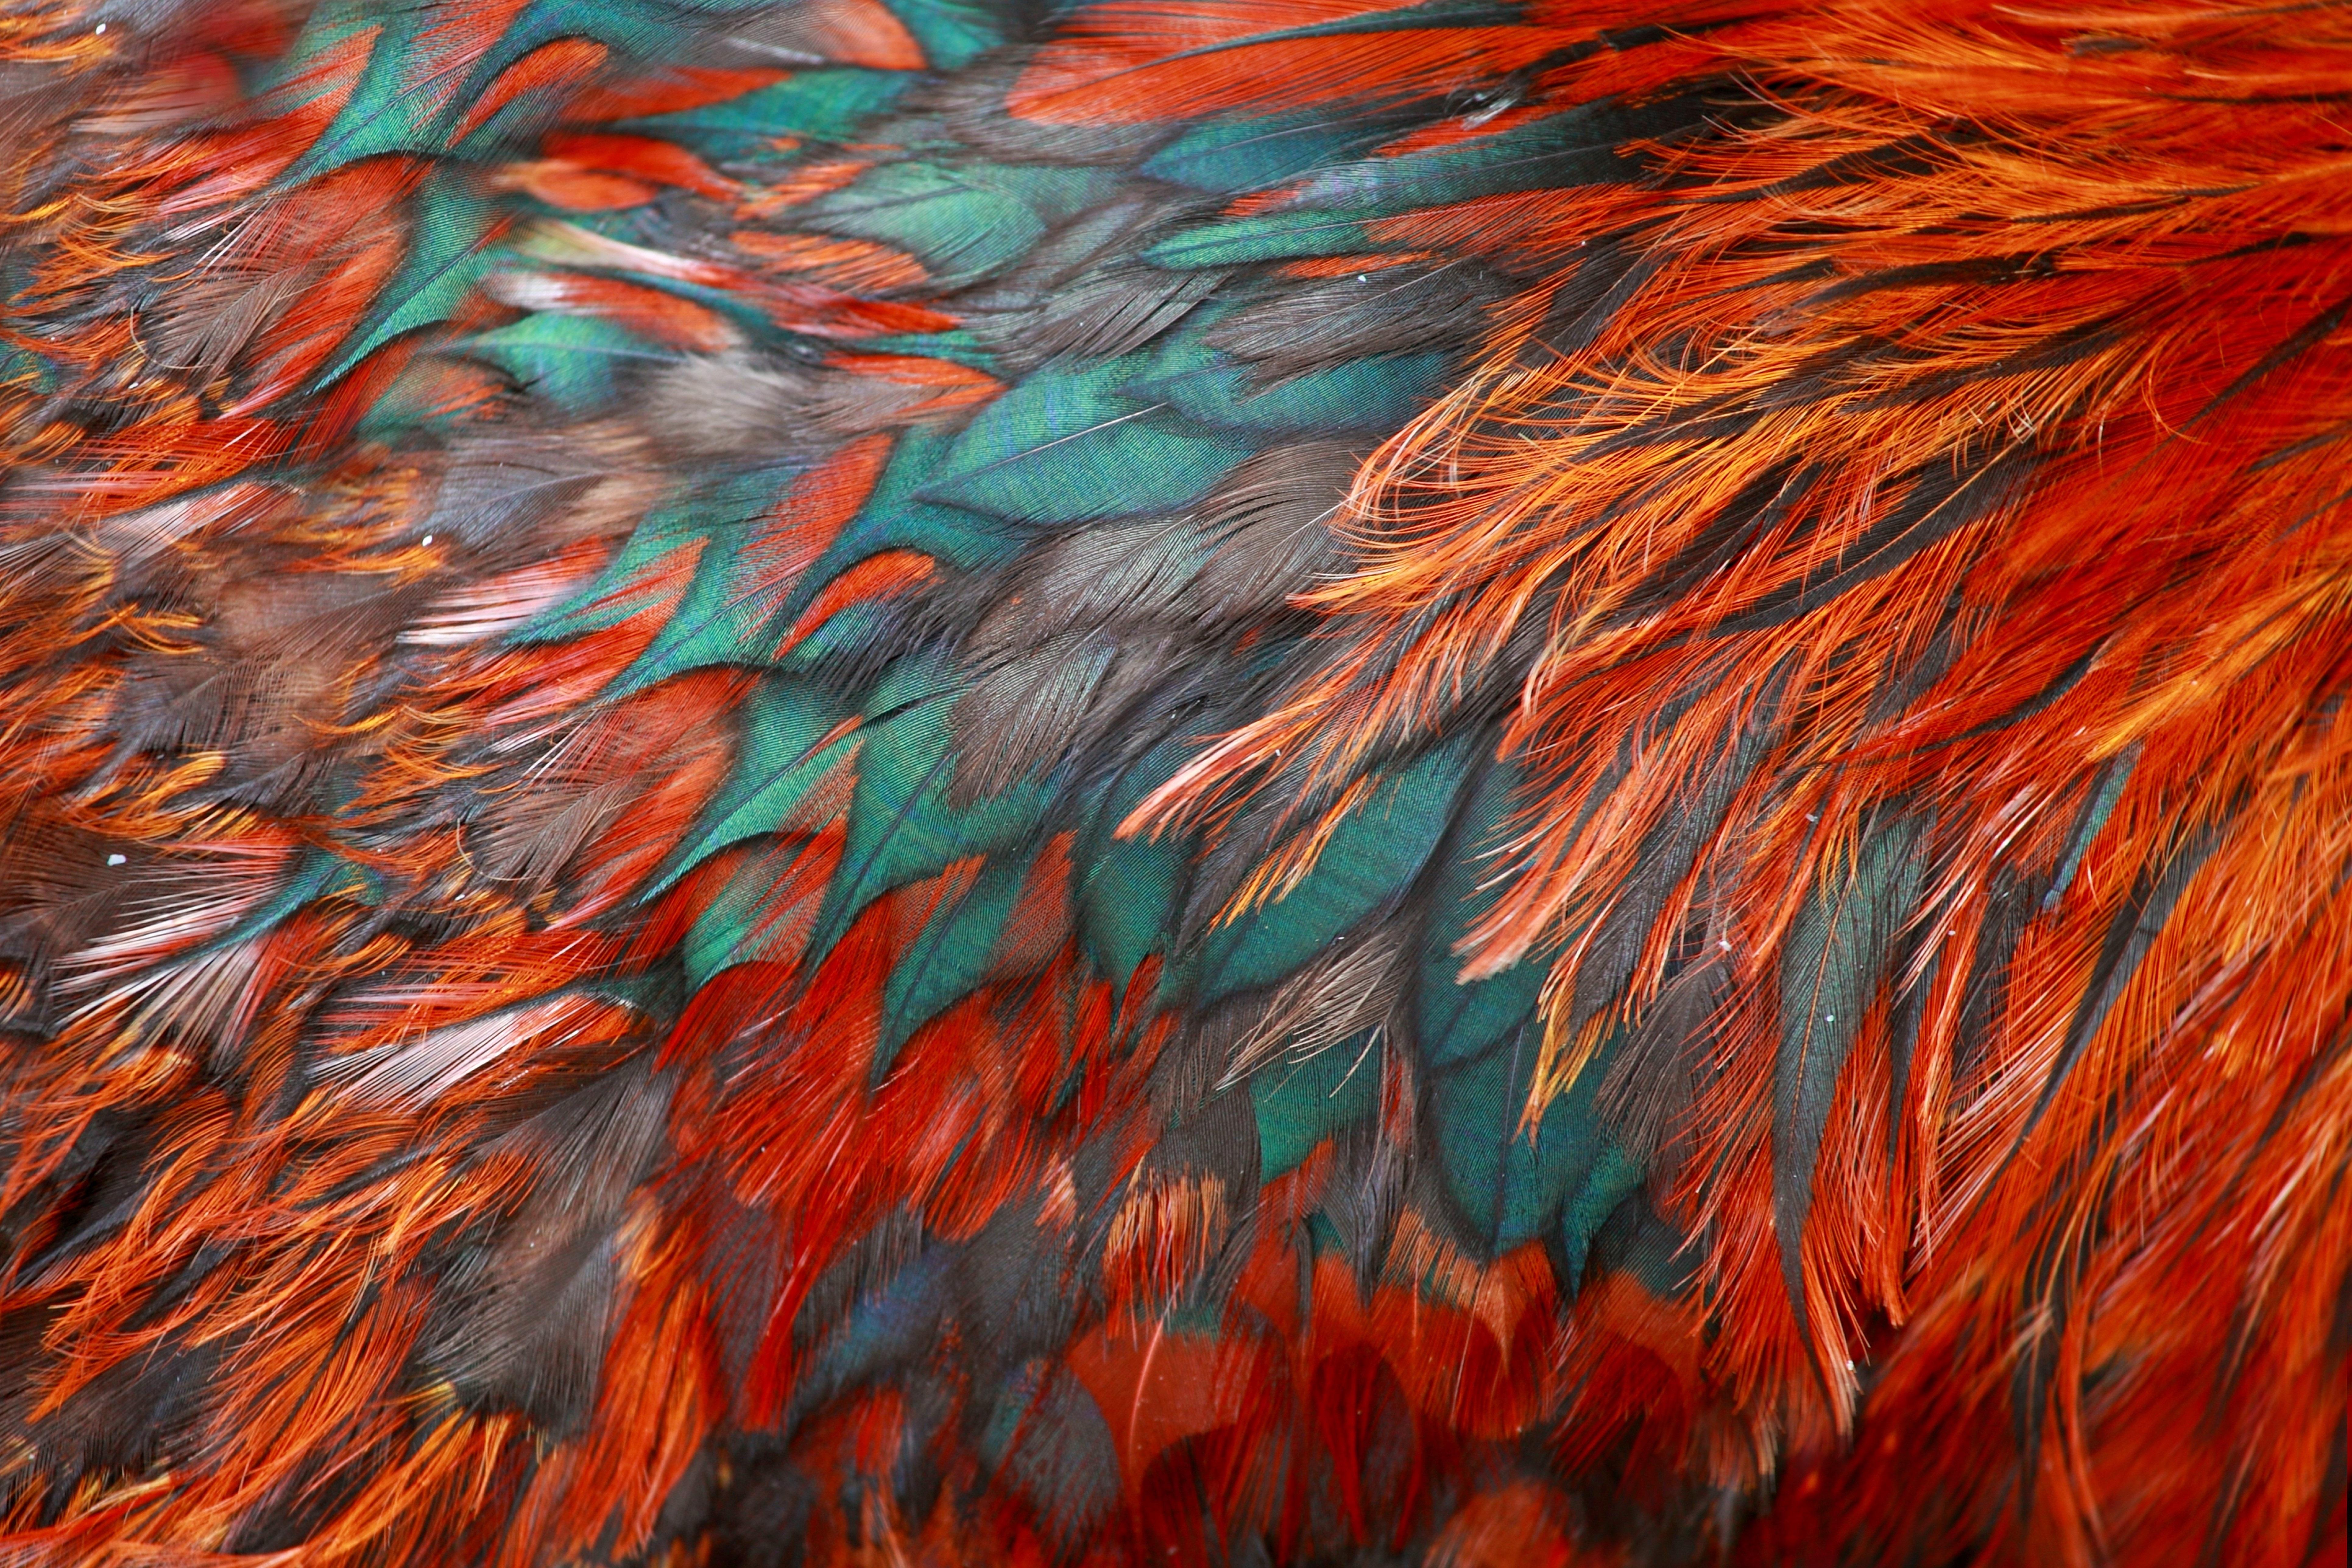 https://s1.1zoom.ru/big3/155/Feathers_Texture_Closeup_460633.jpg